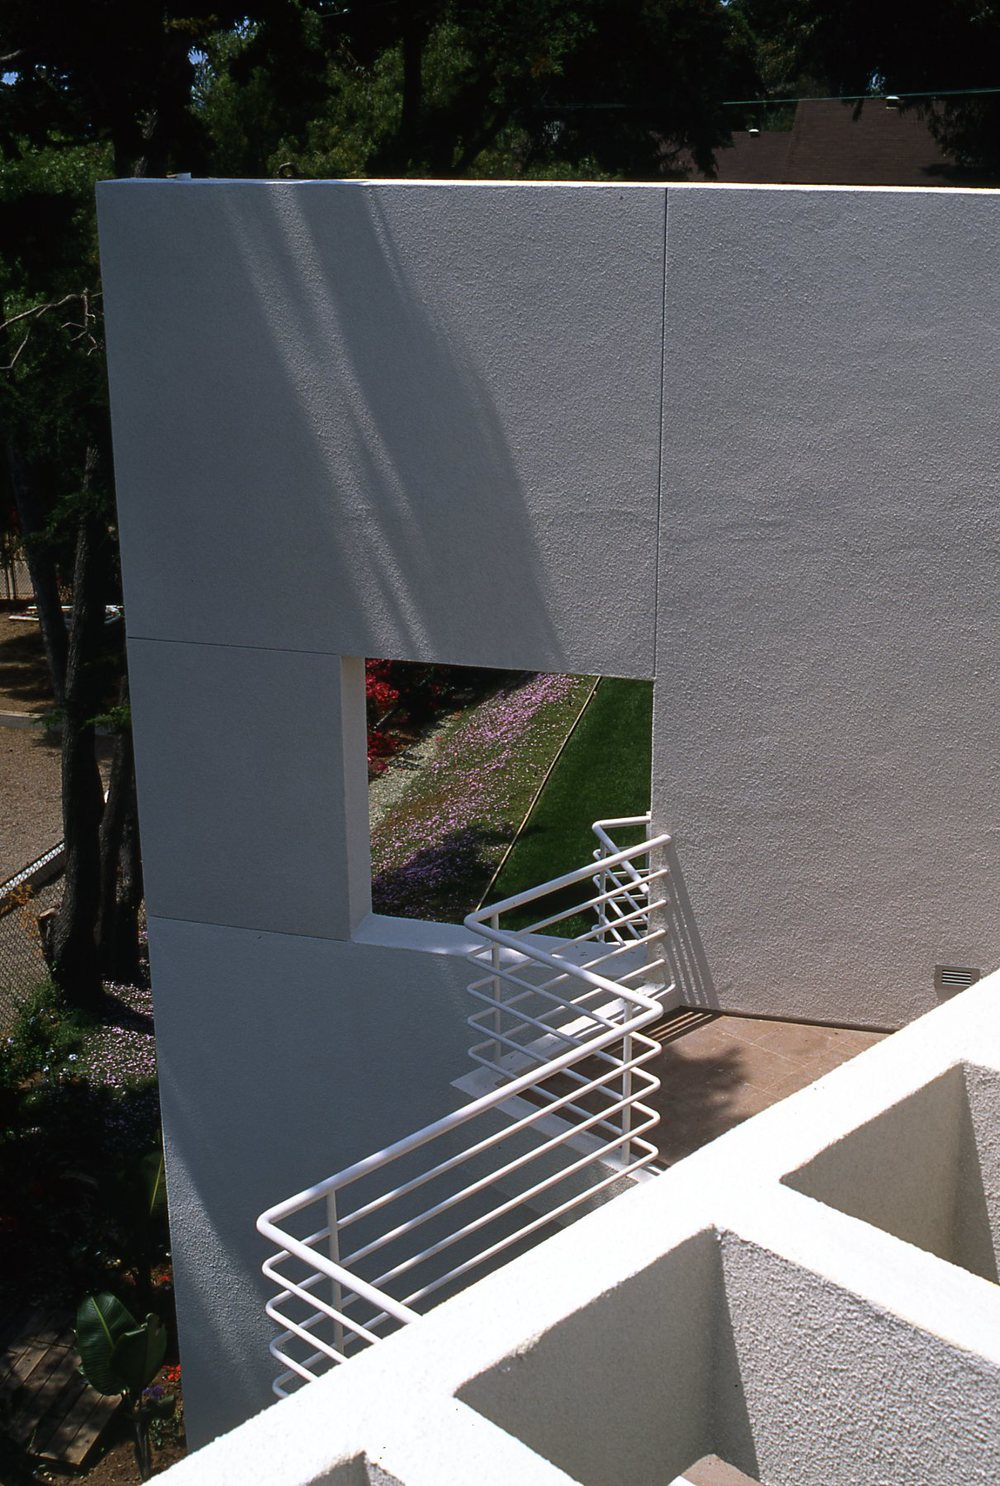 img548.jpg